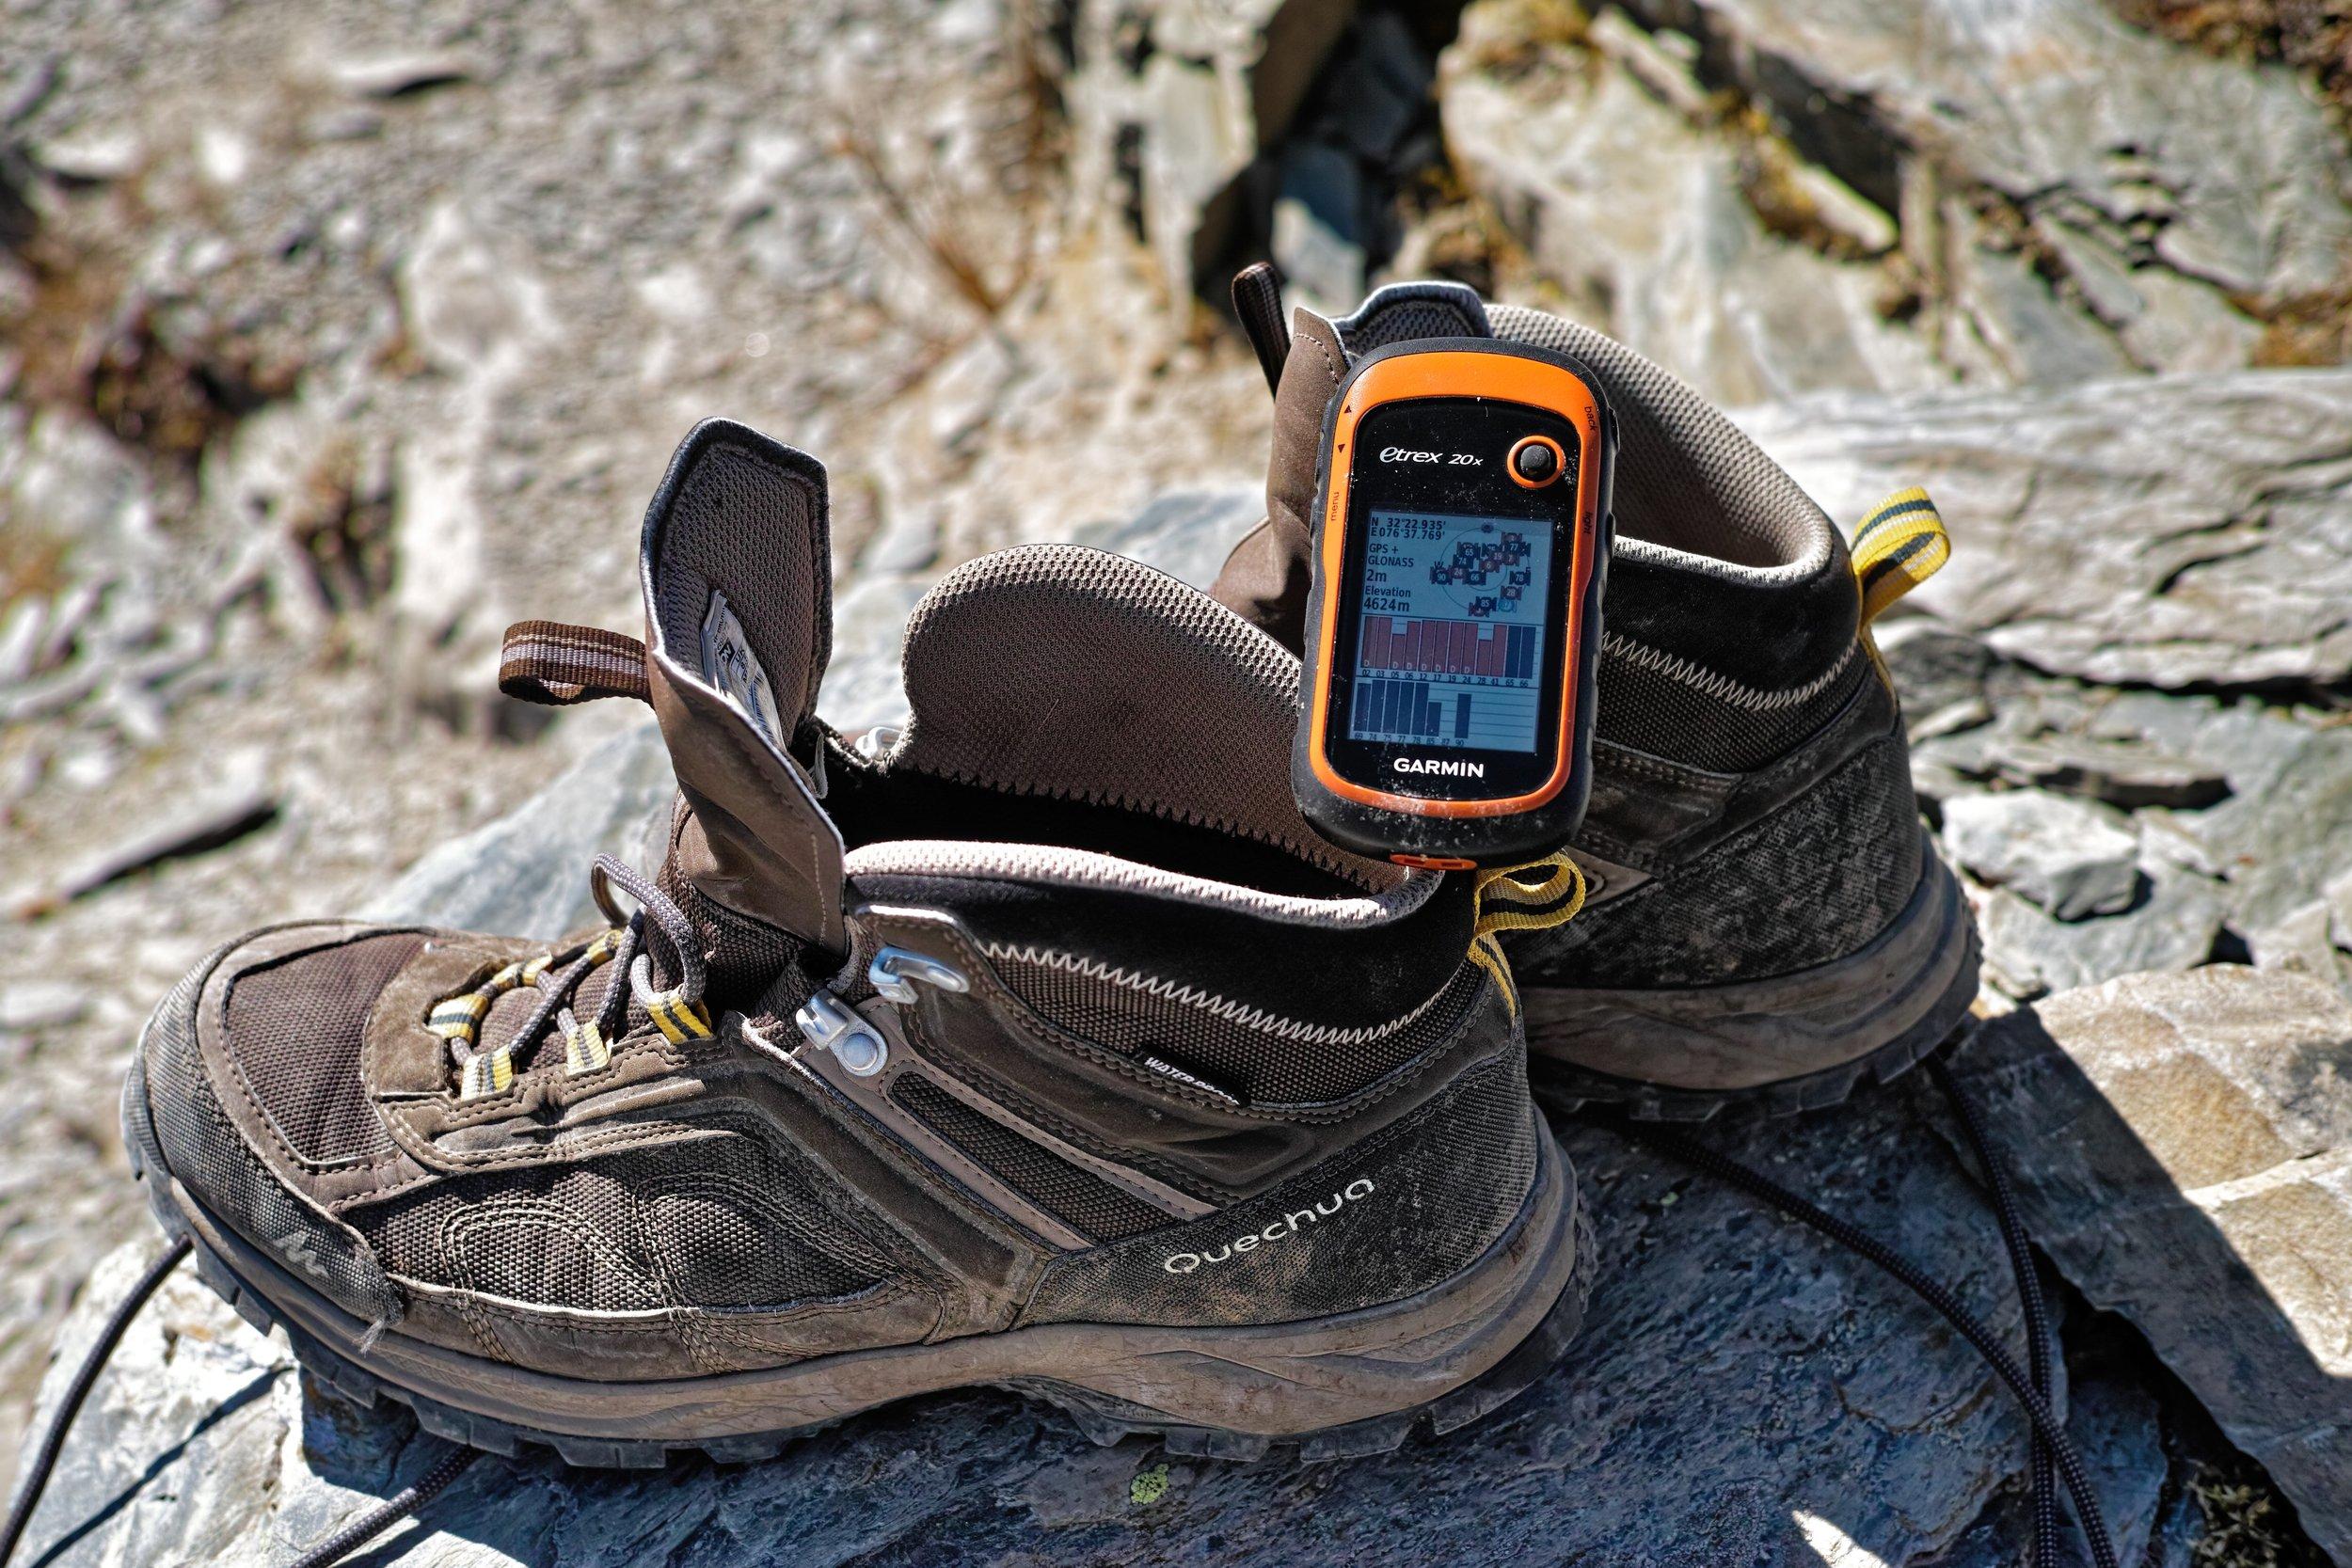 Kalah Pass 4624m (+-2m) recorded with Garmin Etrex20x GPS ( inditramp's review )